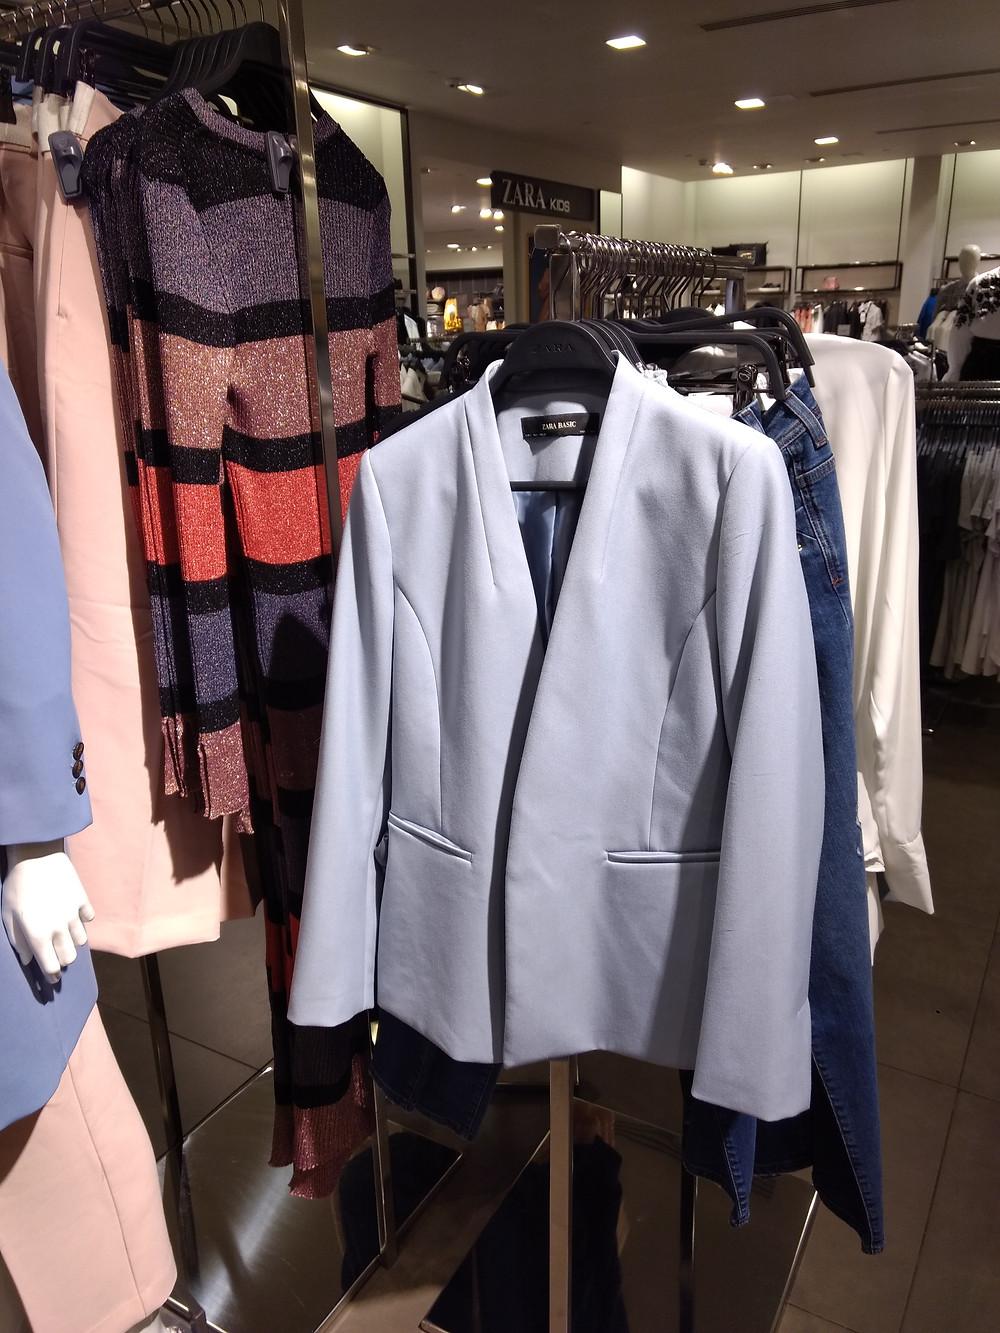 Roupas no inverno na Zara